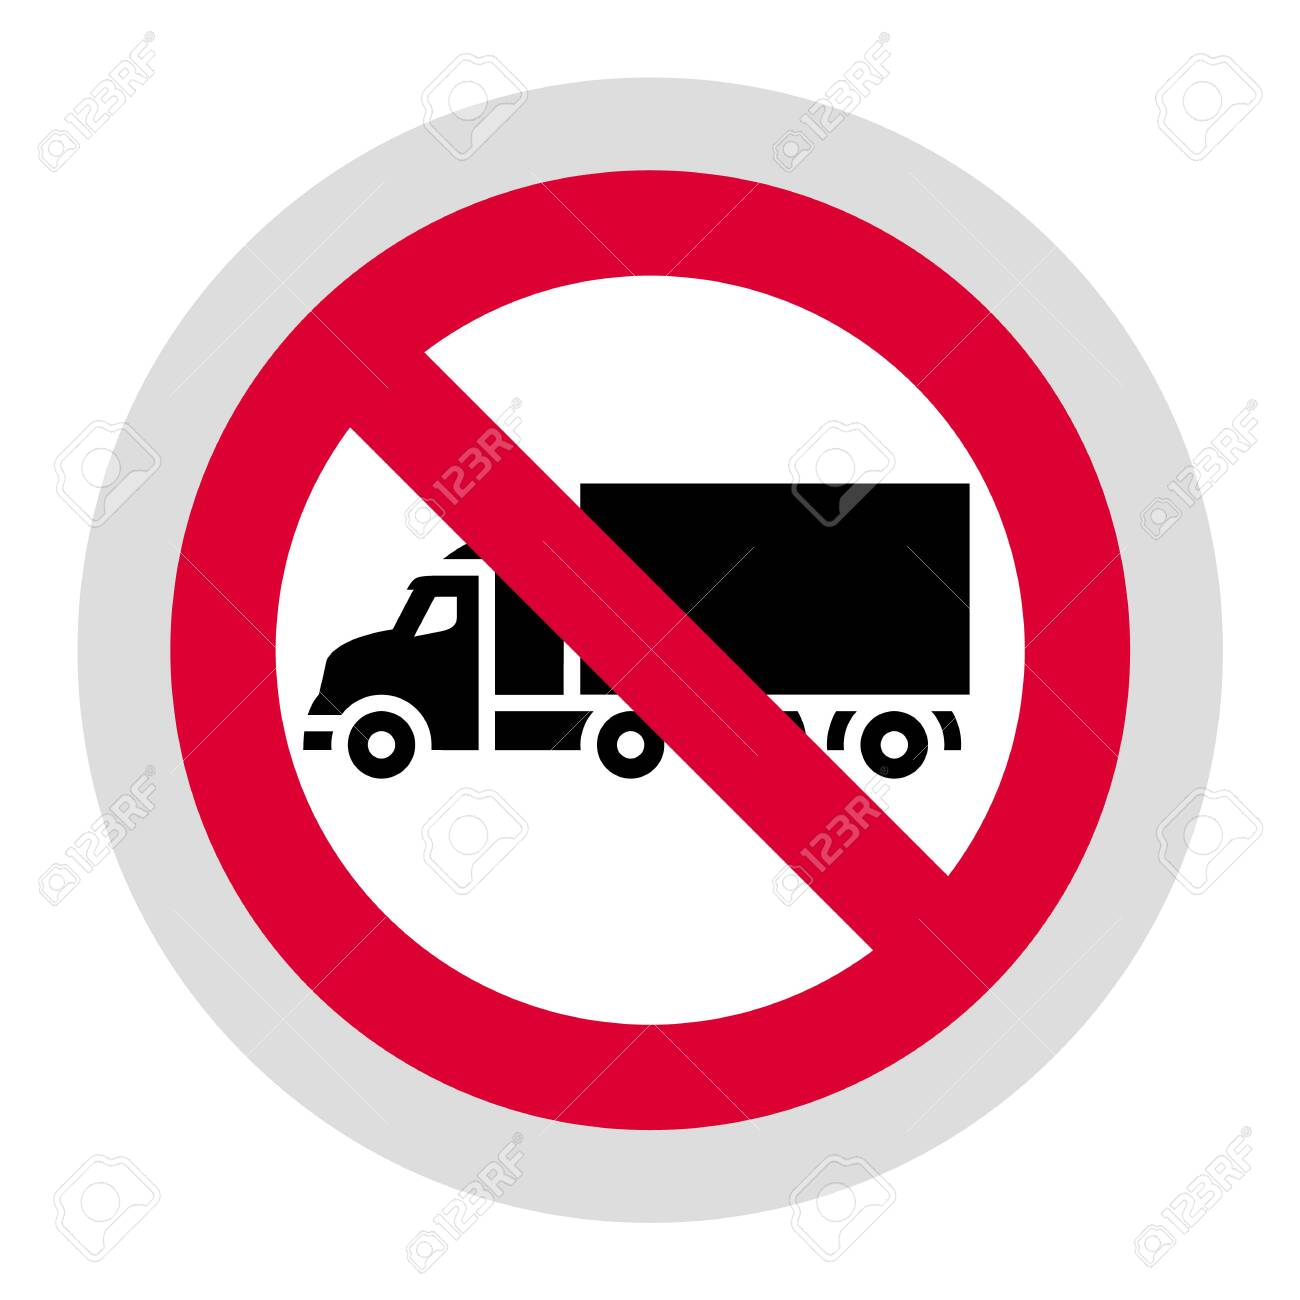 No truck or no parking forbidden sign, modern round sticker, vector illustration for your design - 134068424